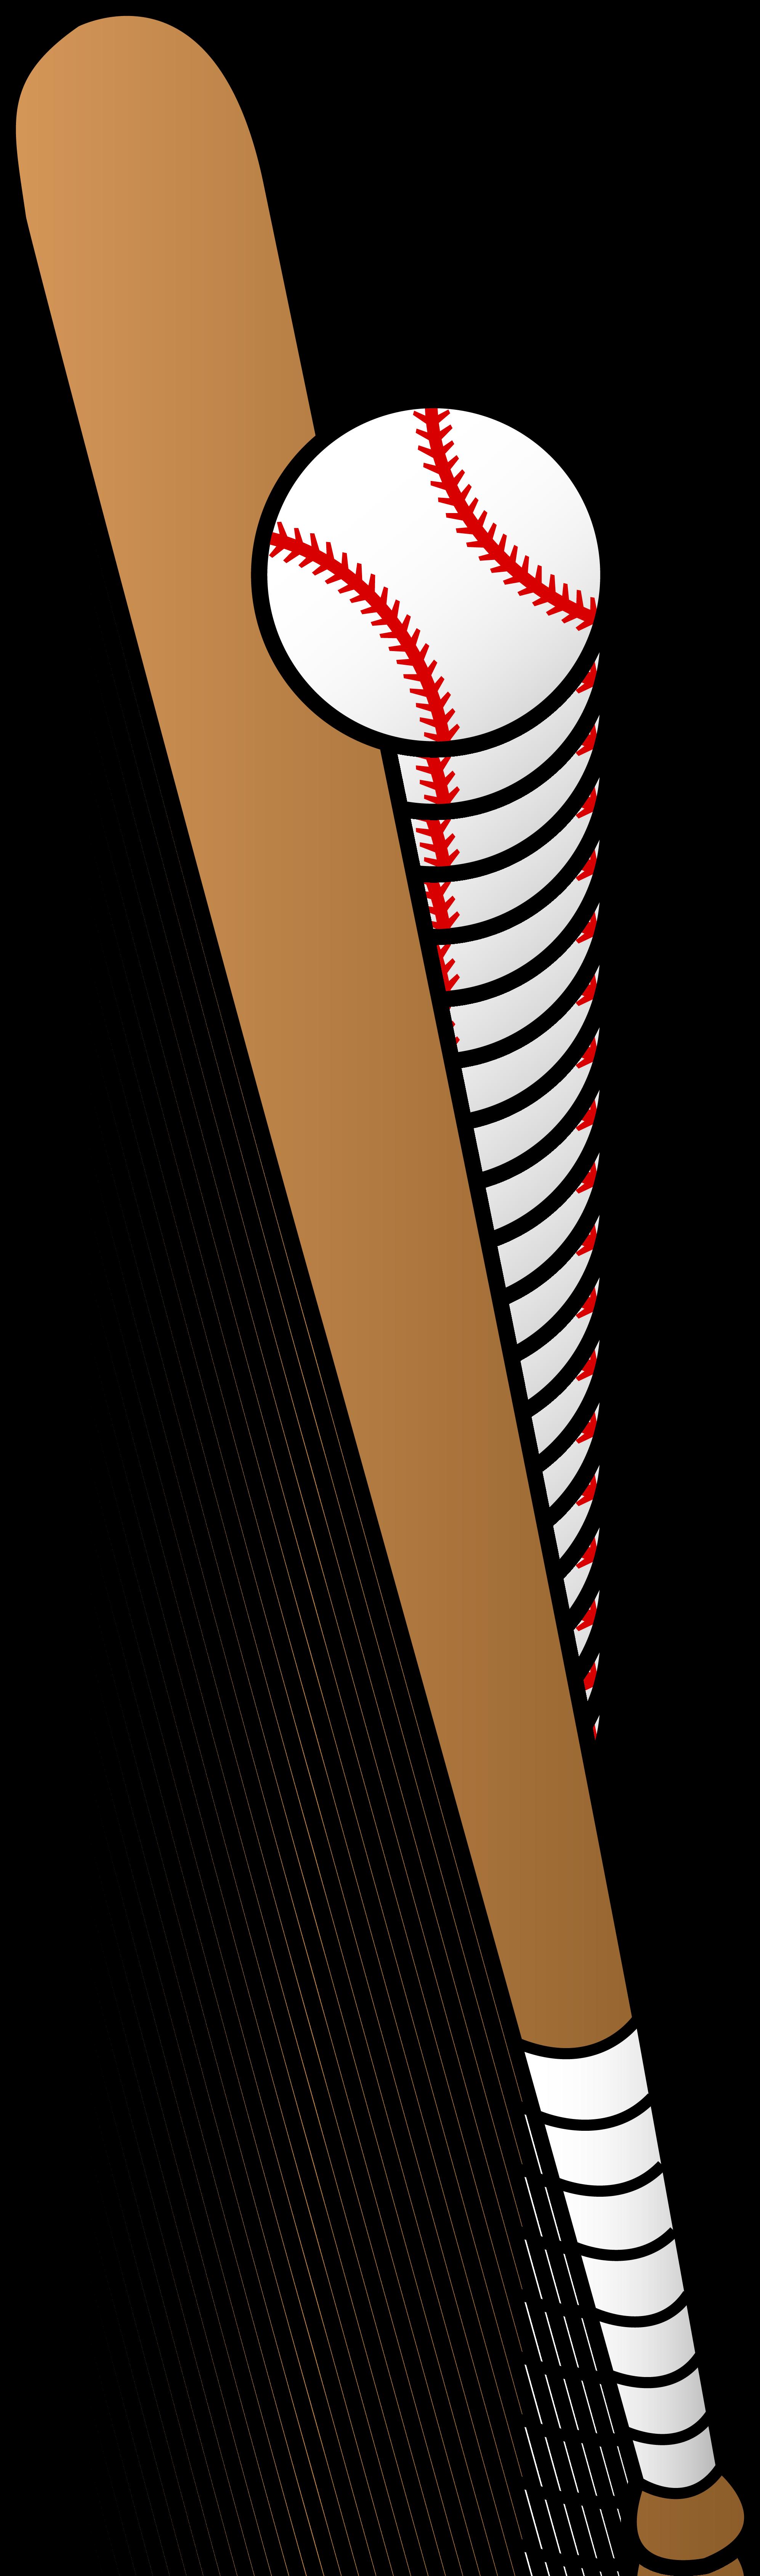 Baseball Bat Hitting Ball PNG - 50001